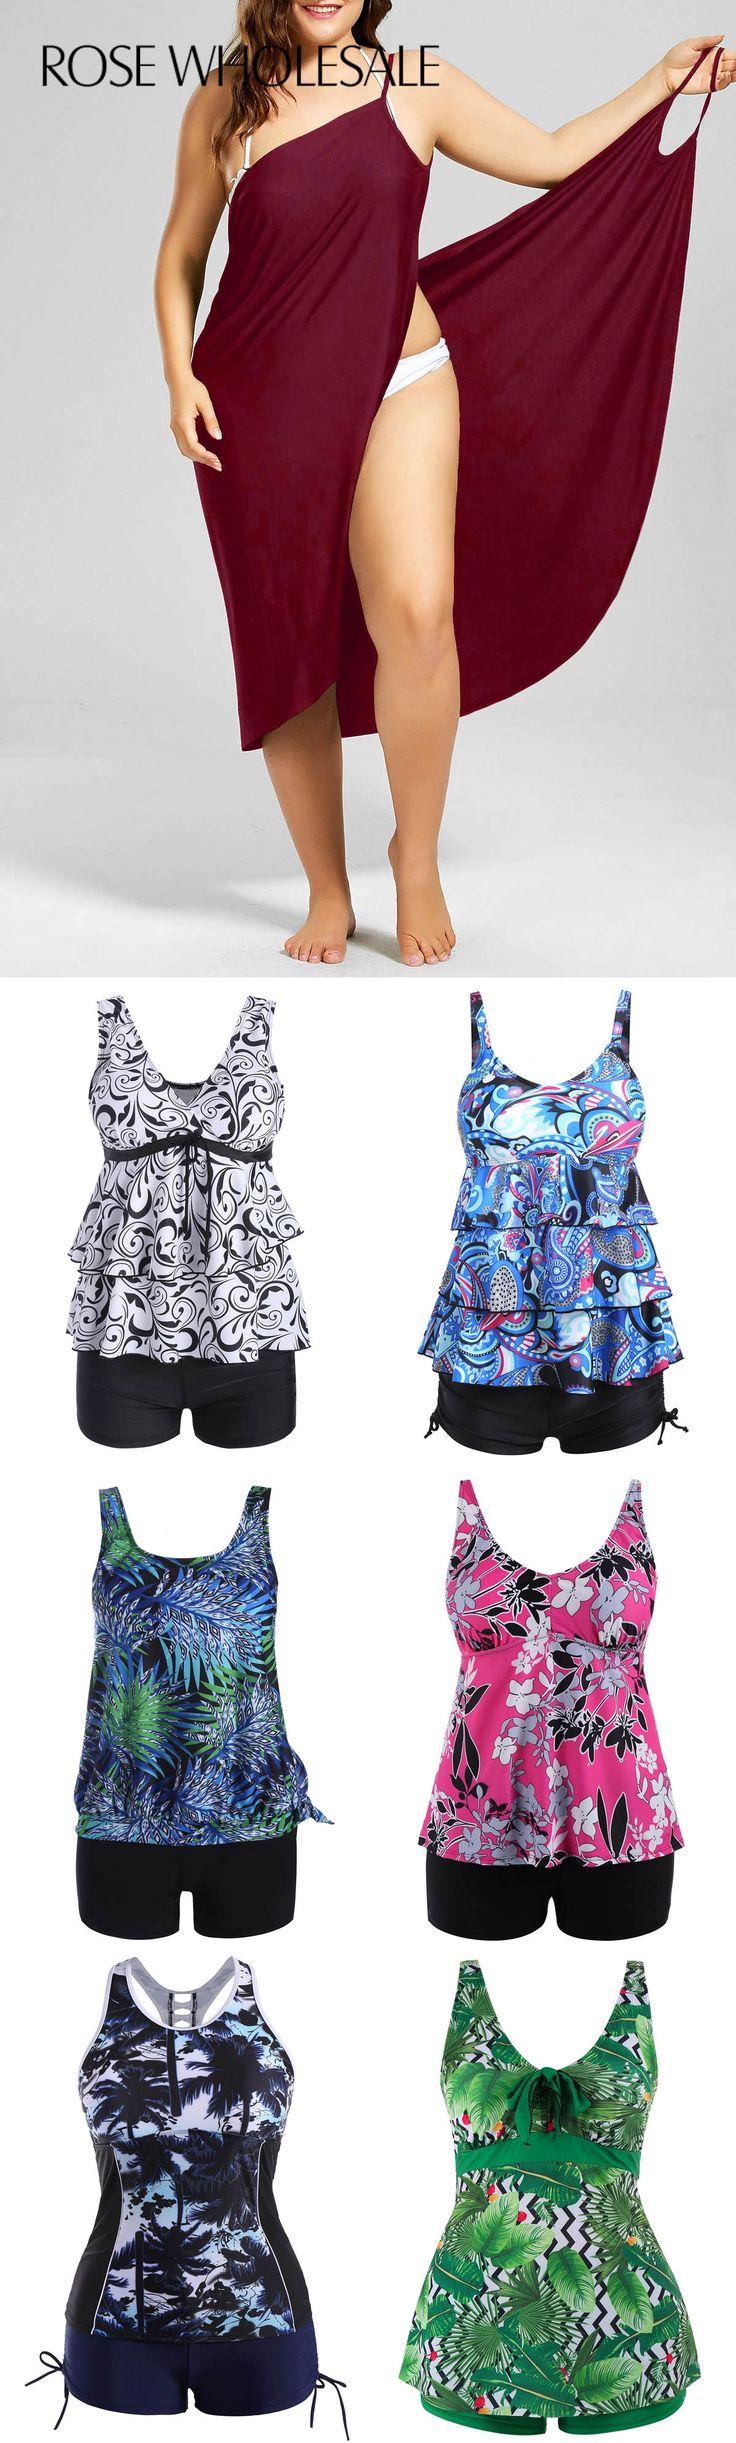 Up to 80% off,rosewholesale plus size swimsuit for women | rosewholesale,rosewholesale.com,rosewholesale plus size,rosewholesale bathing suit,rosewholesale swimsuit,rosewholesale plus sizse swimsuit,swimsuit,tankini,fakini,bikini,coverup,swimwear,bathing suit | #rosewholesale #plussize #swimsuit